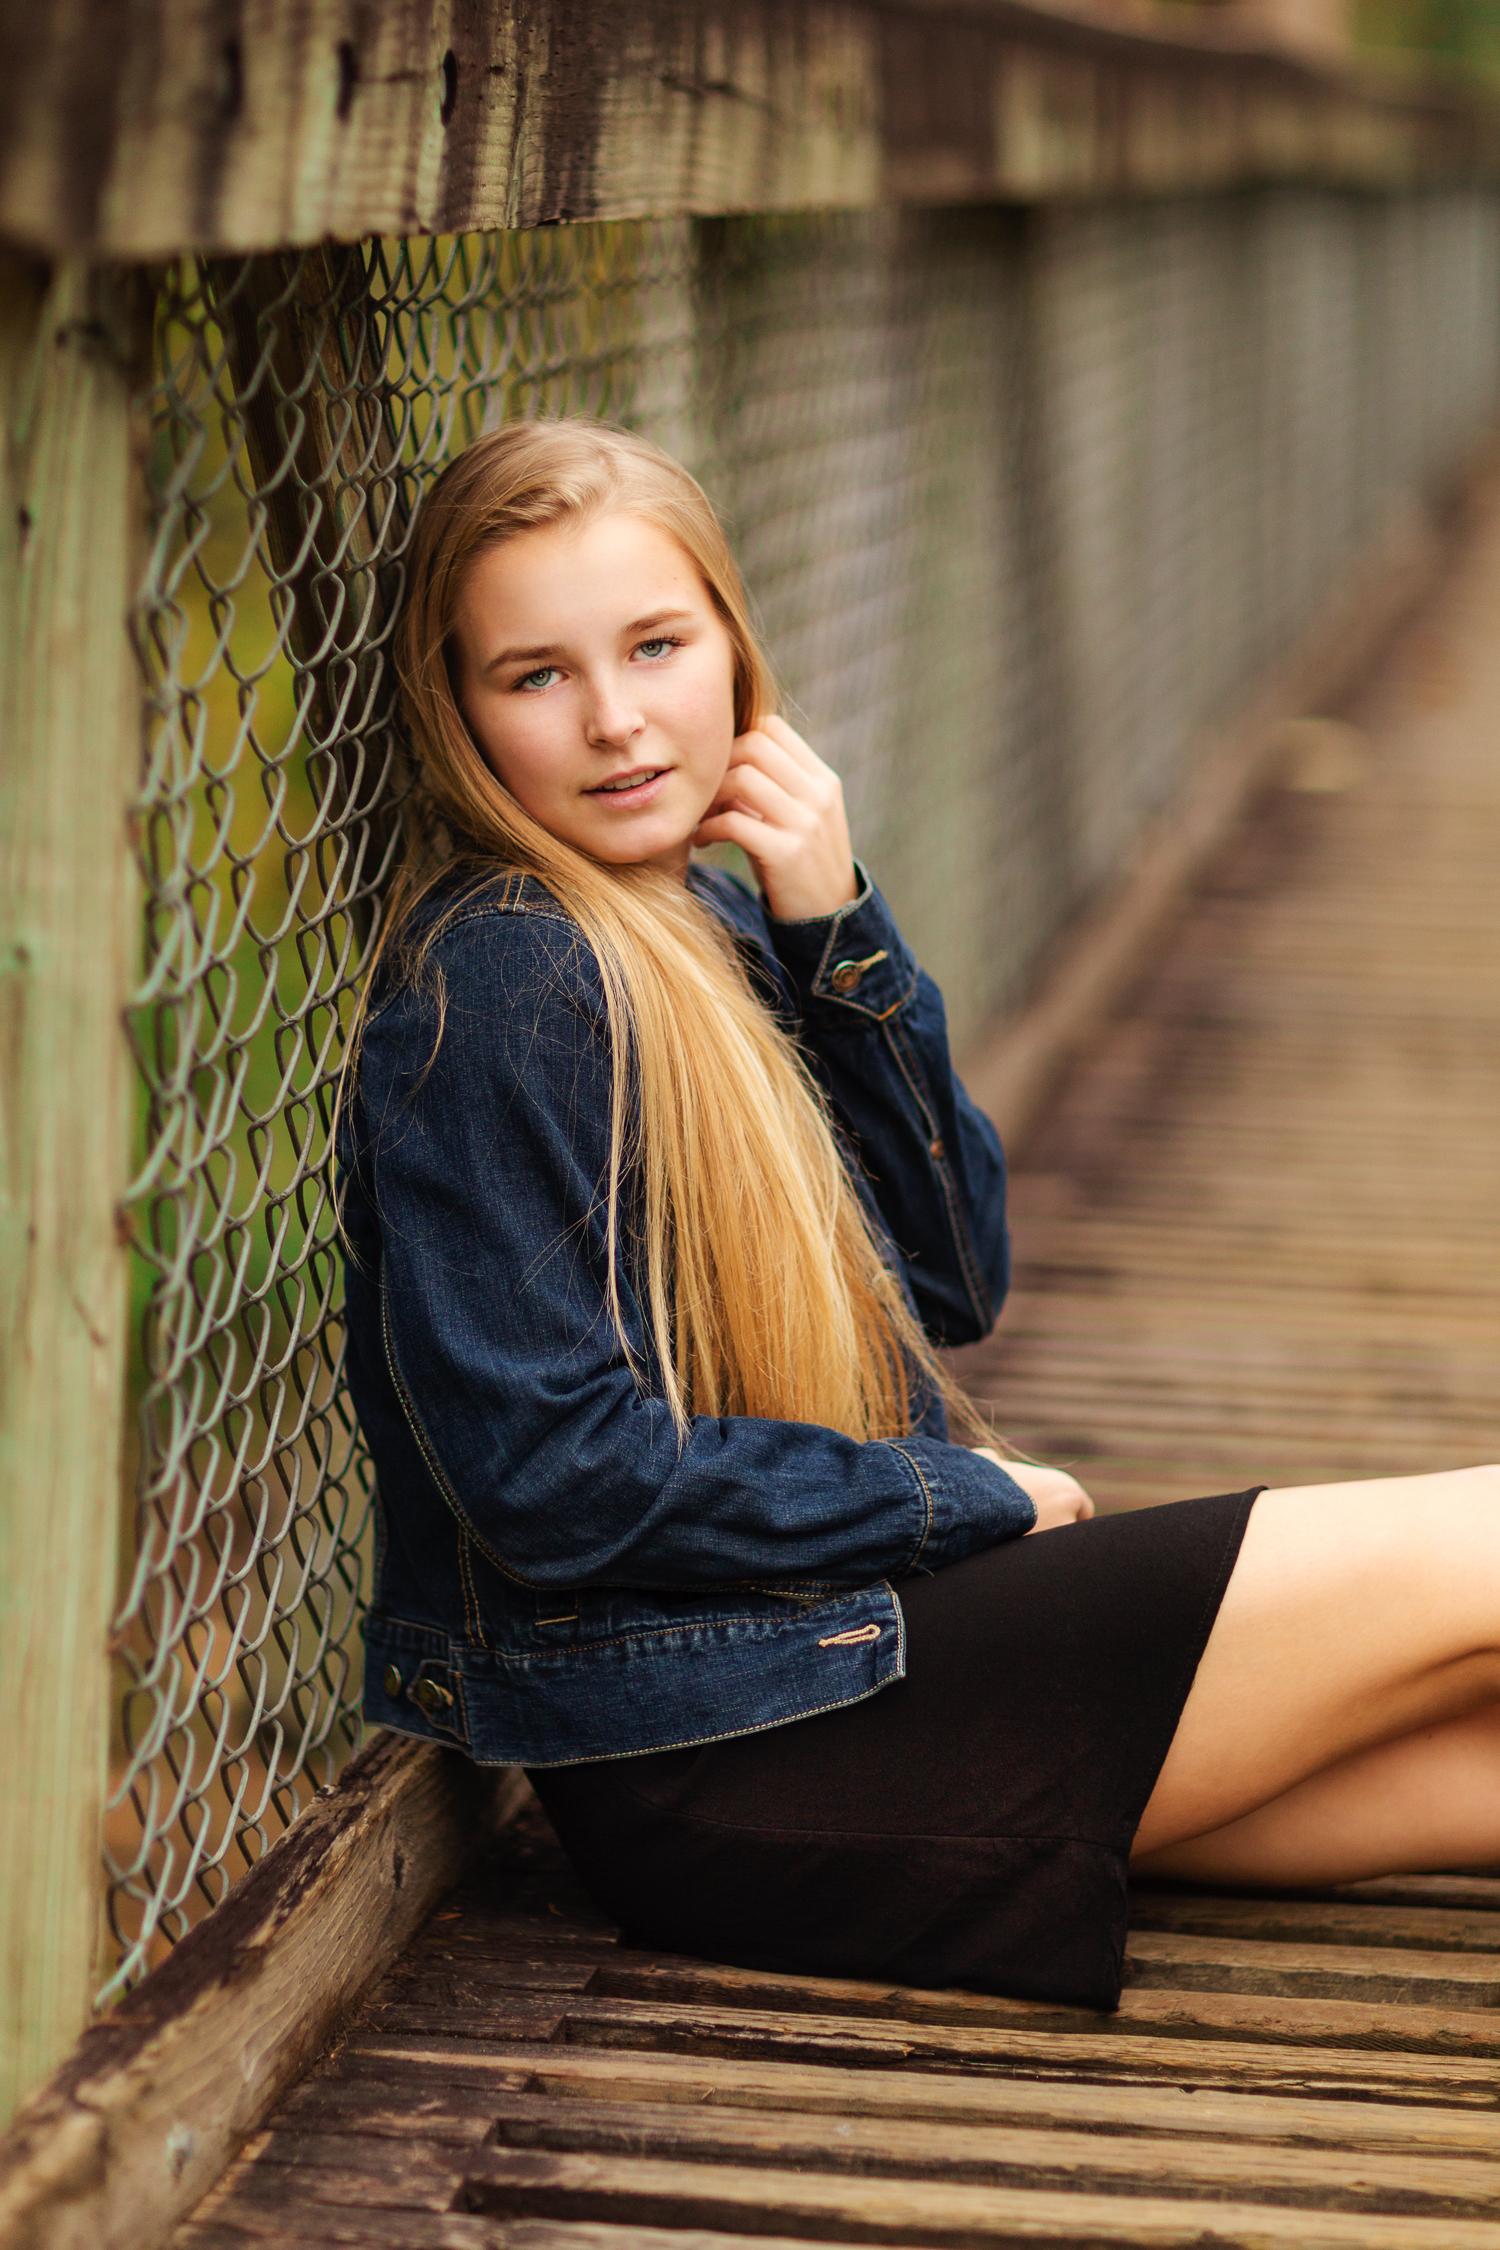 ariellanoellephotography-actor-headshot-modeling-portfolio-actress-seattle-area-washington-photographer-portraits-1-3.jpg